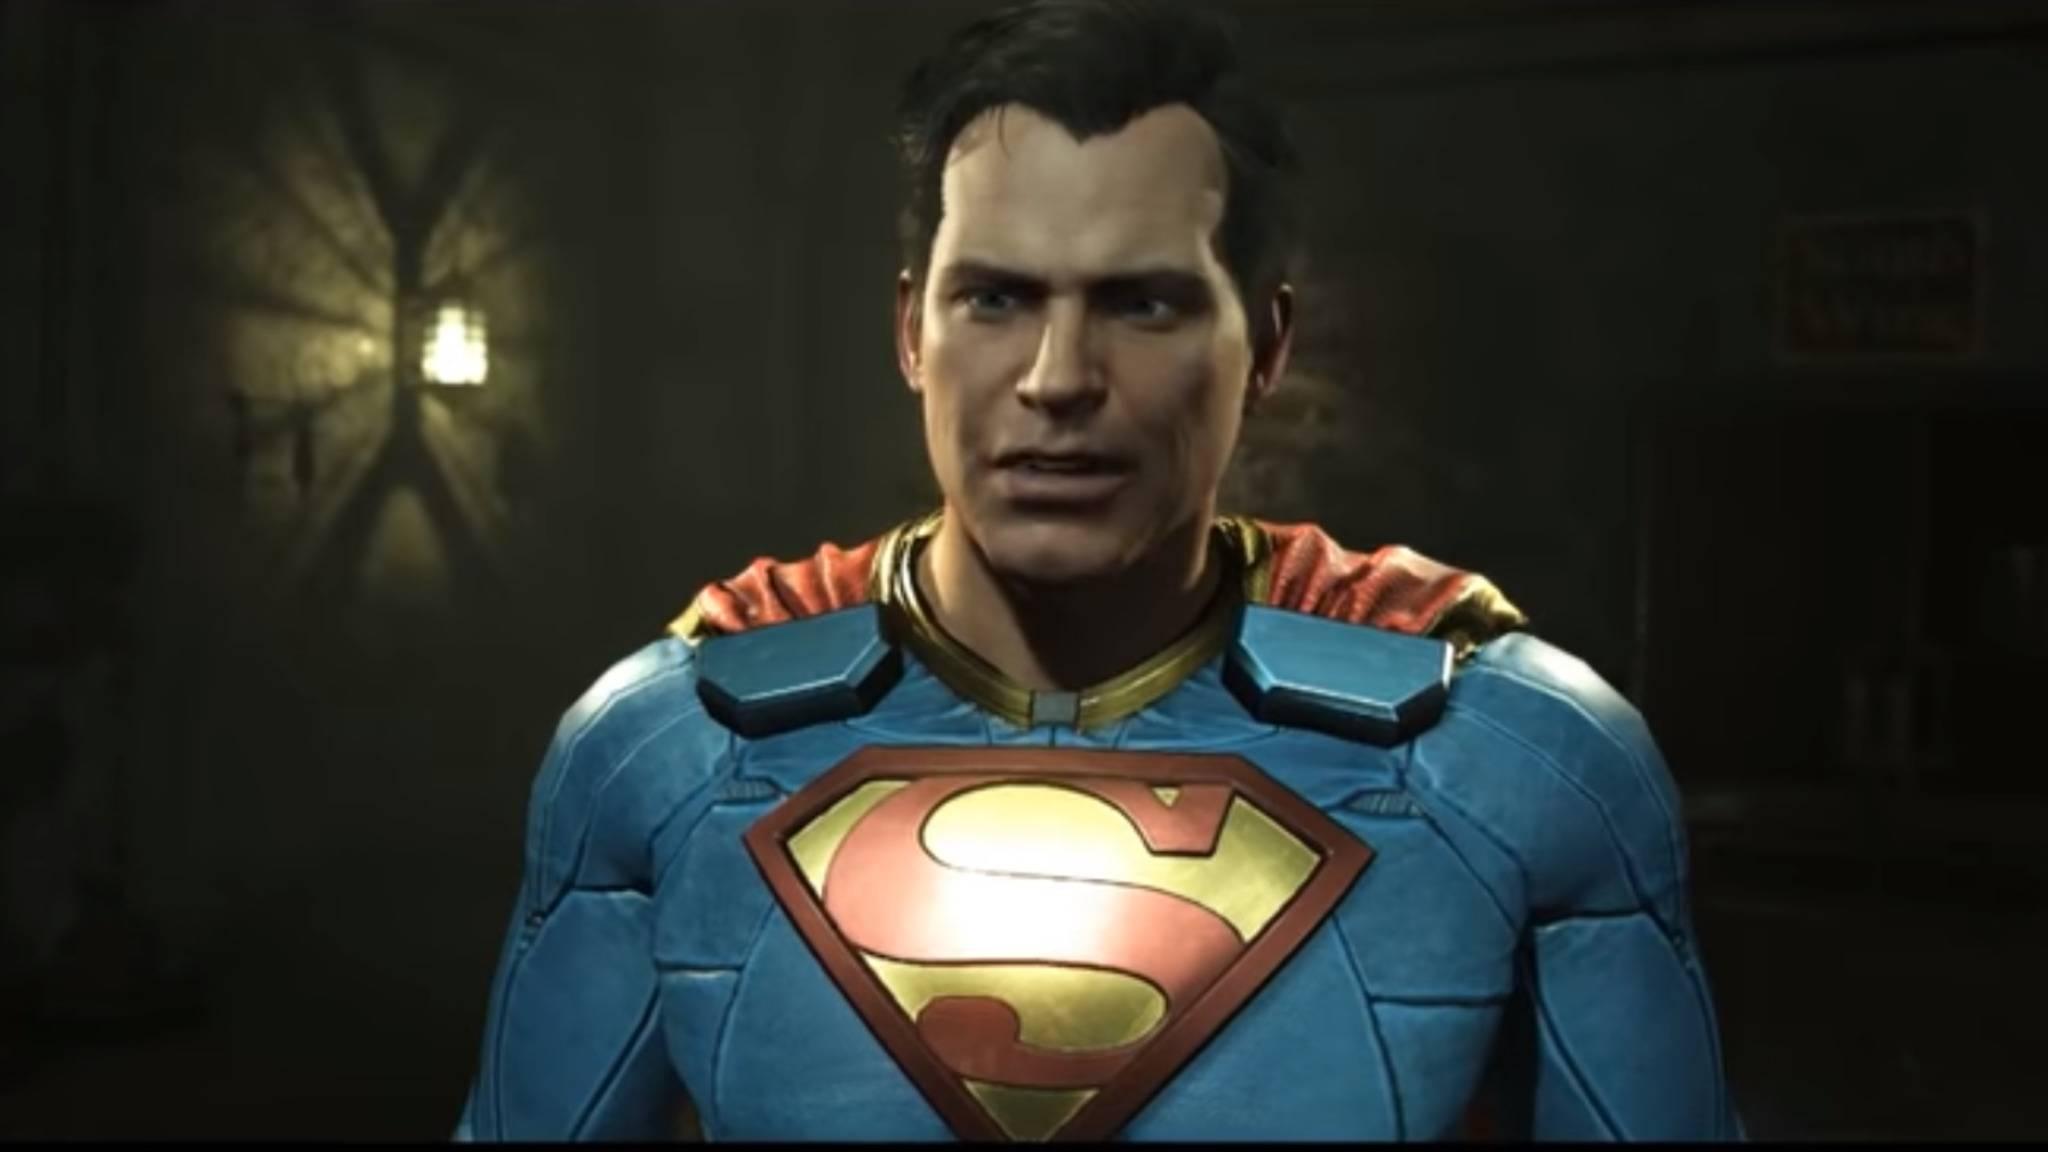 Superman_Injustice2_cutscene_16_9